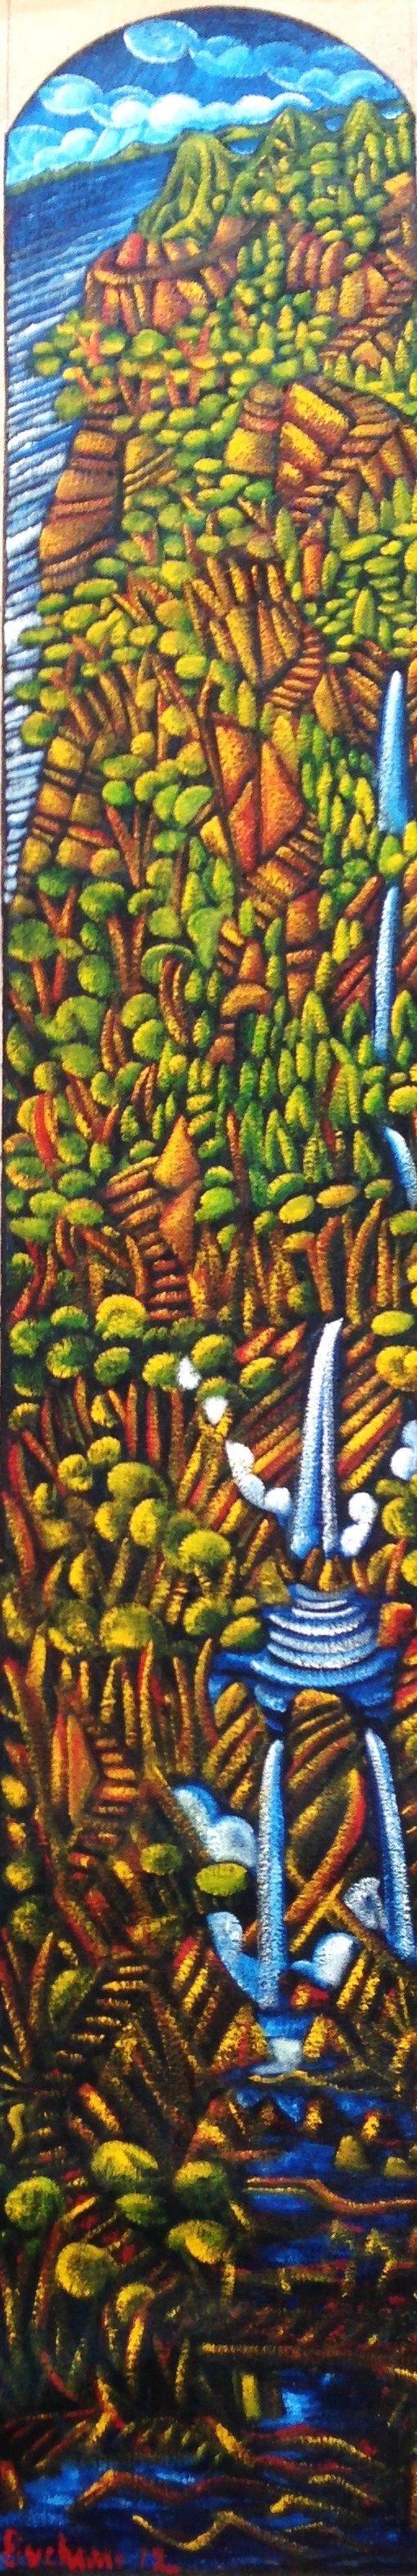 dean buchanan painting of waterfall - Google Search